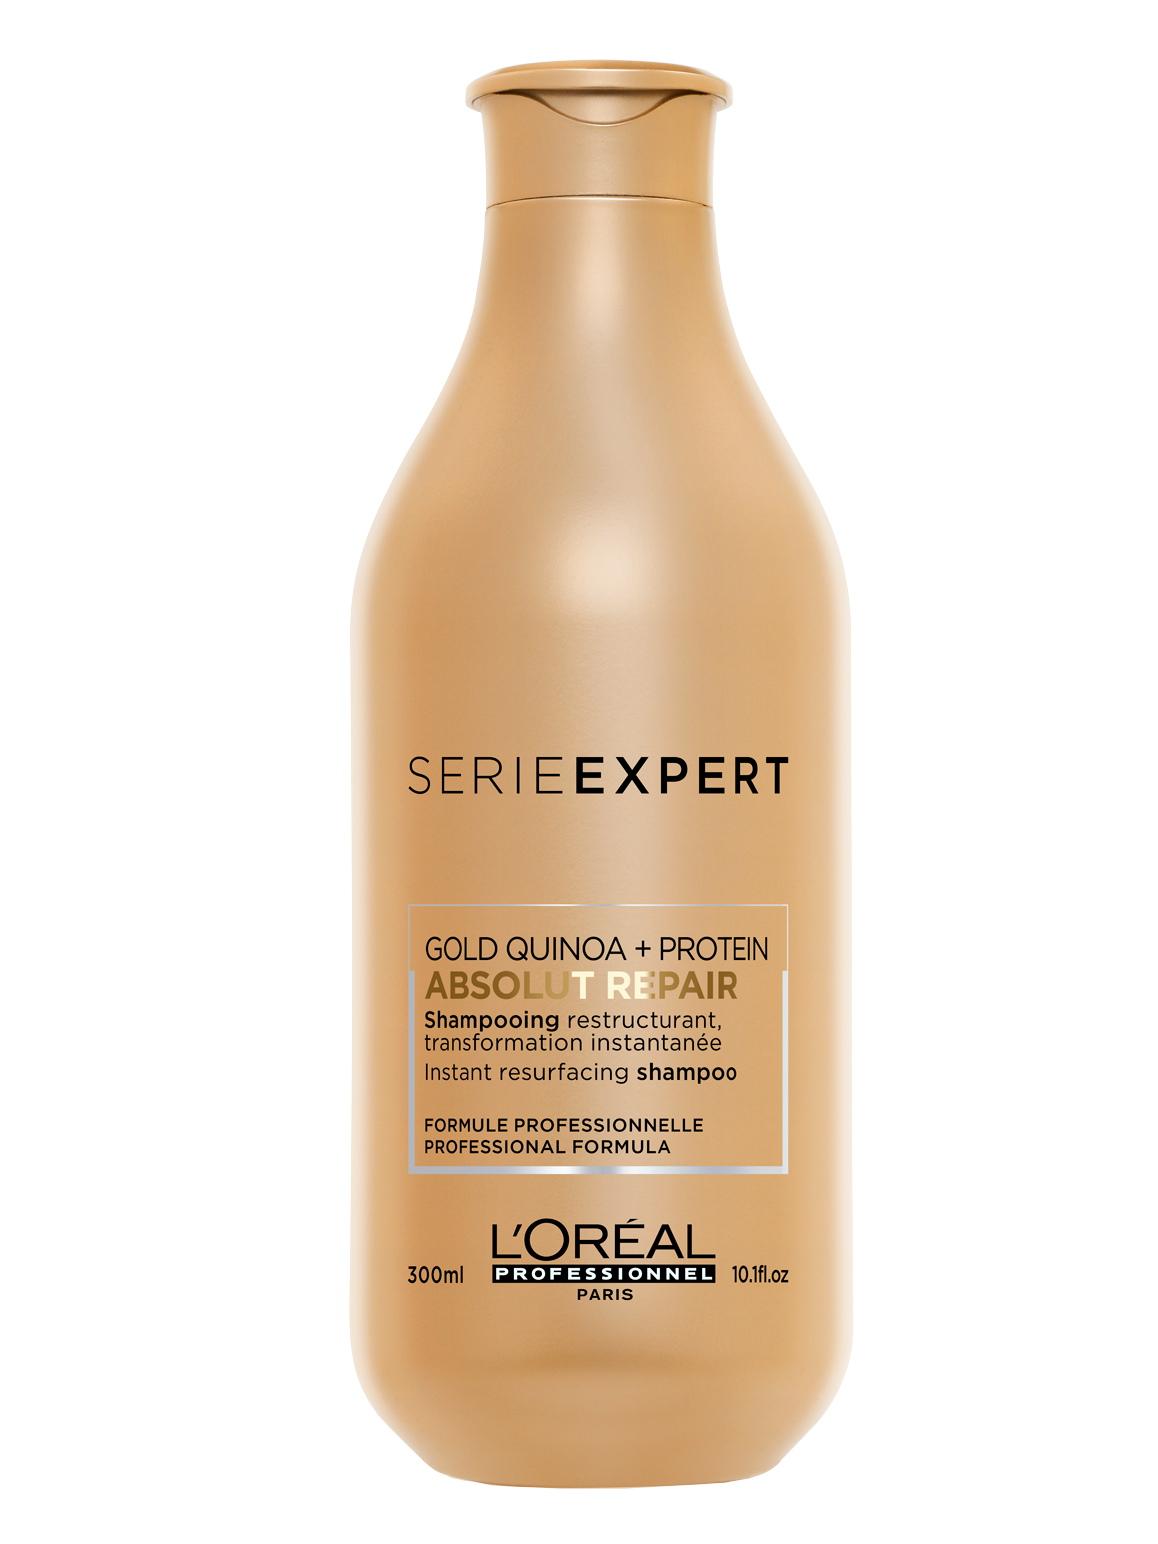 Šampon pro zcitlivělé a poškozené vlasy Loréal Absolut Repair - 300 ml + DÁREK ZDARMA